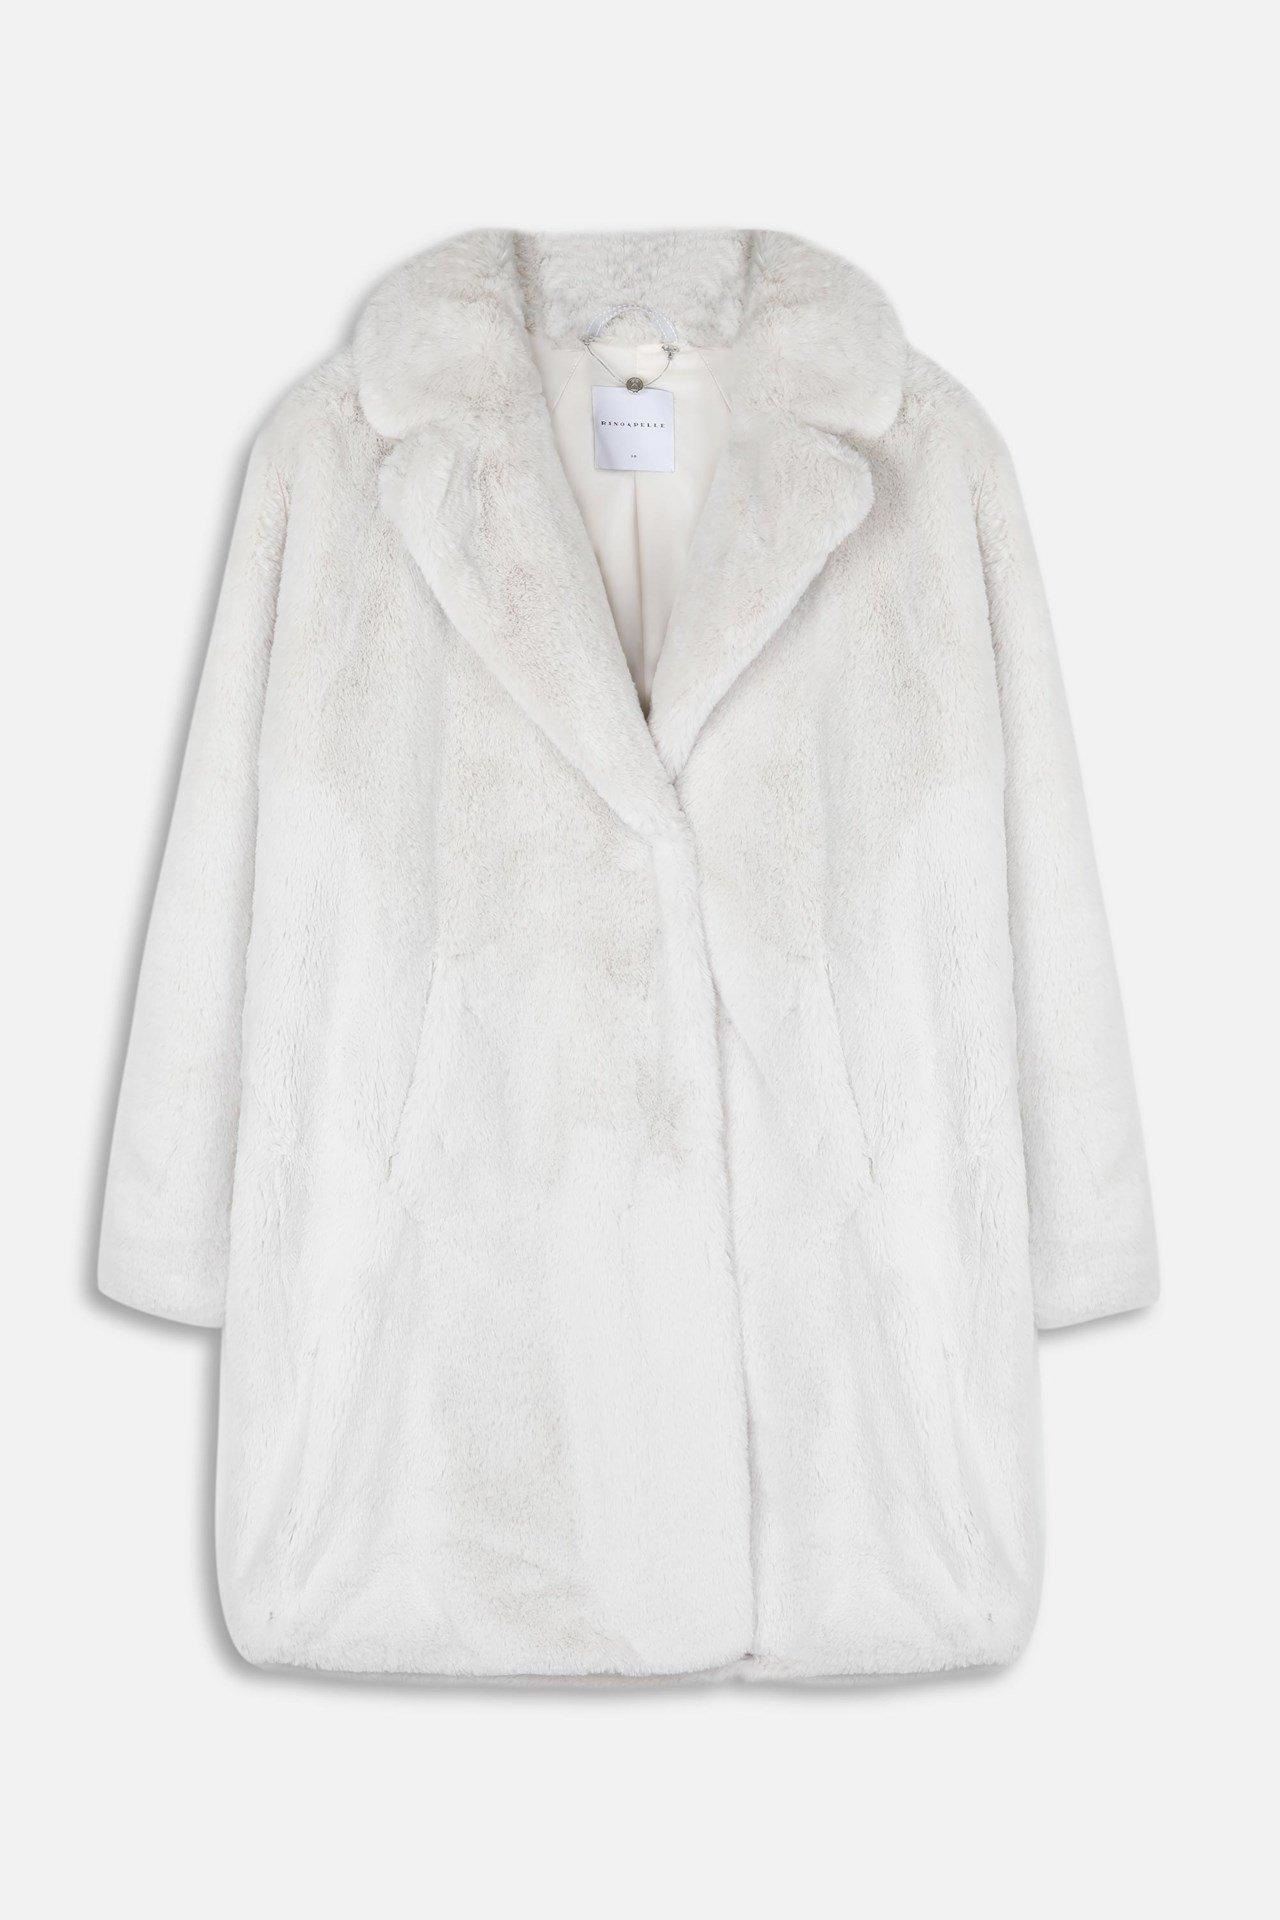 Rino&Pelle Faux fur coat